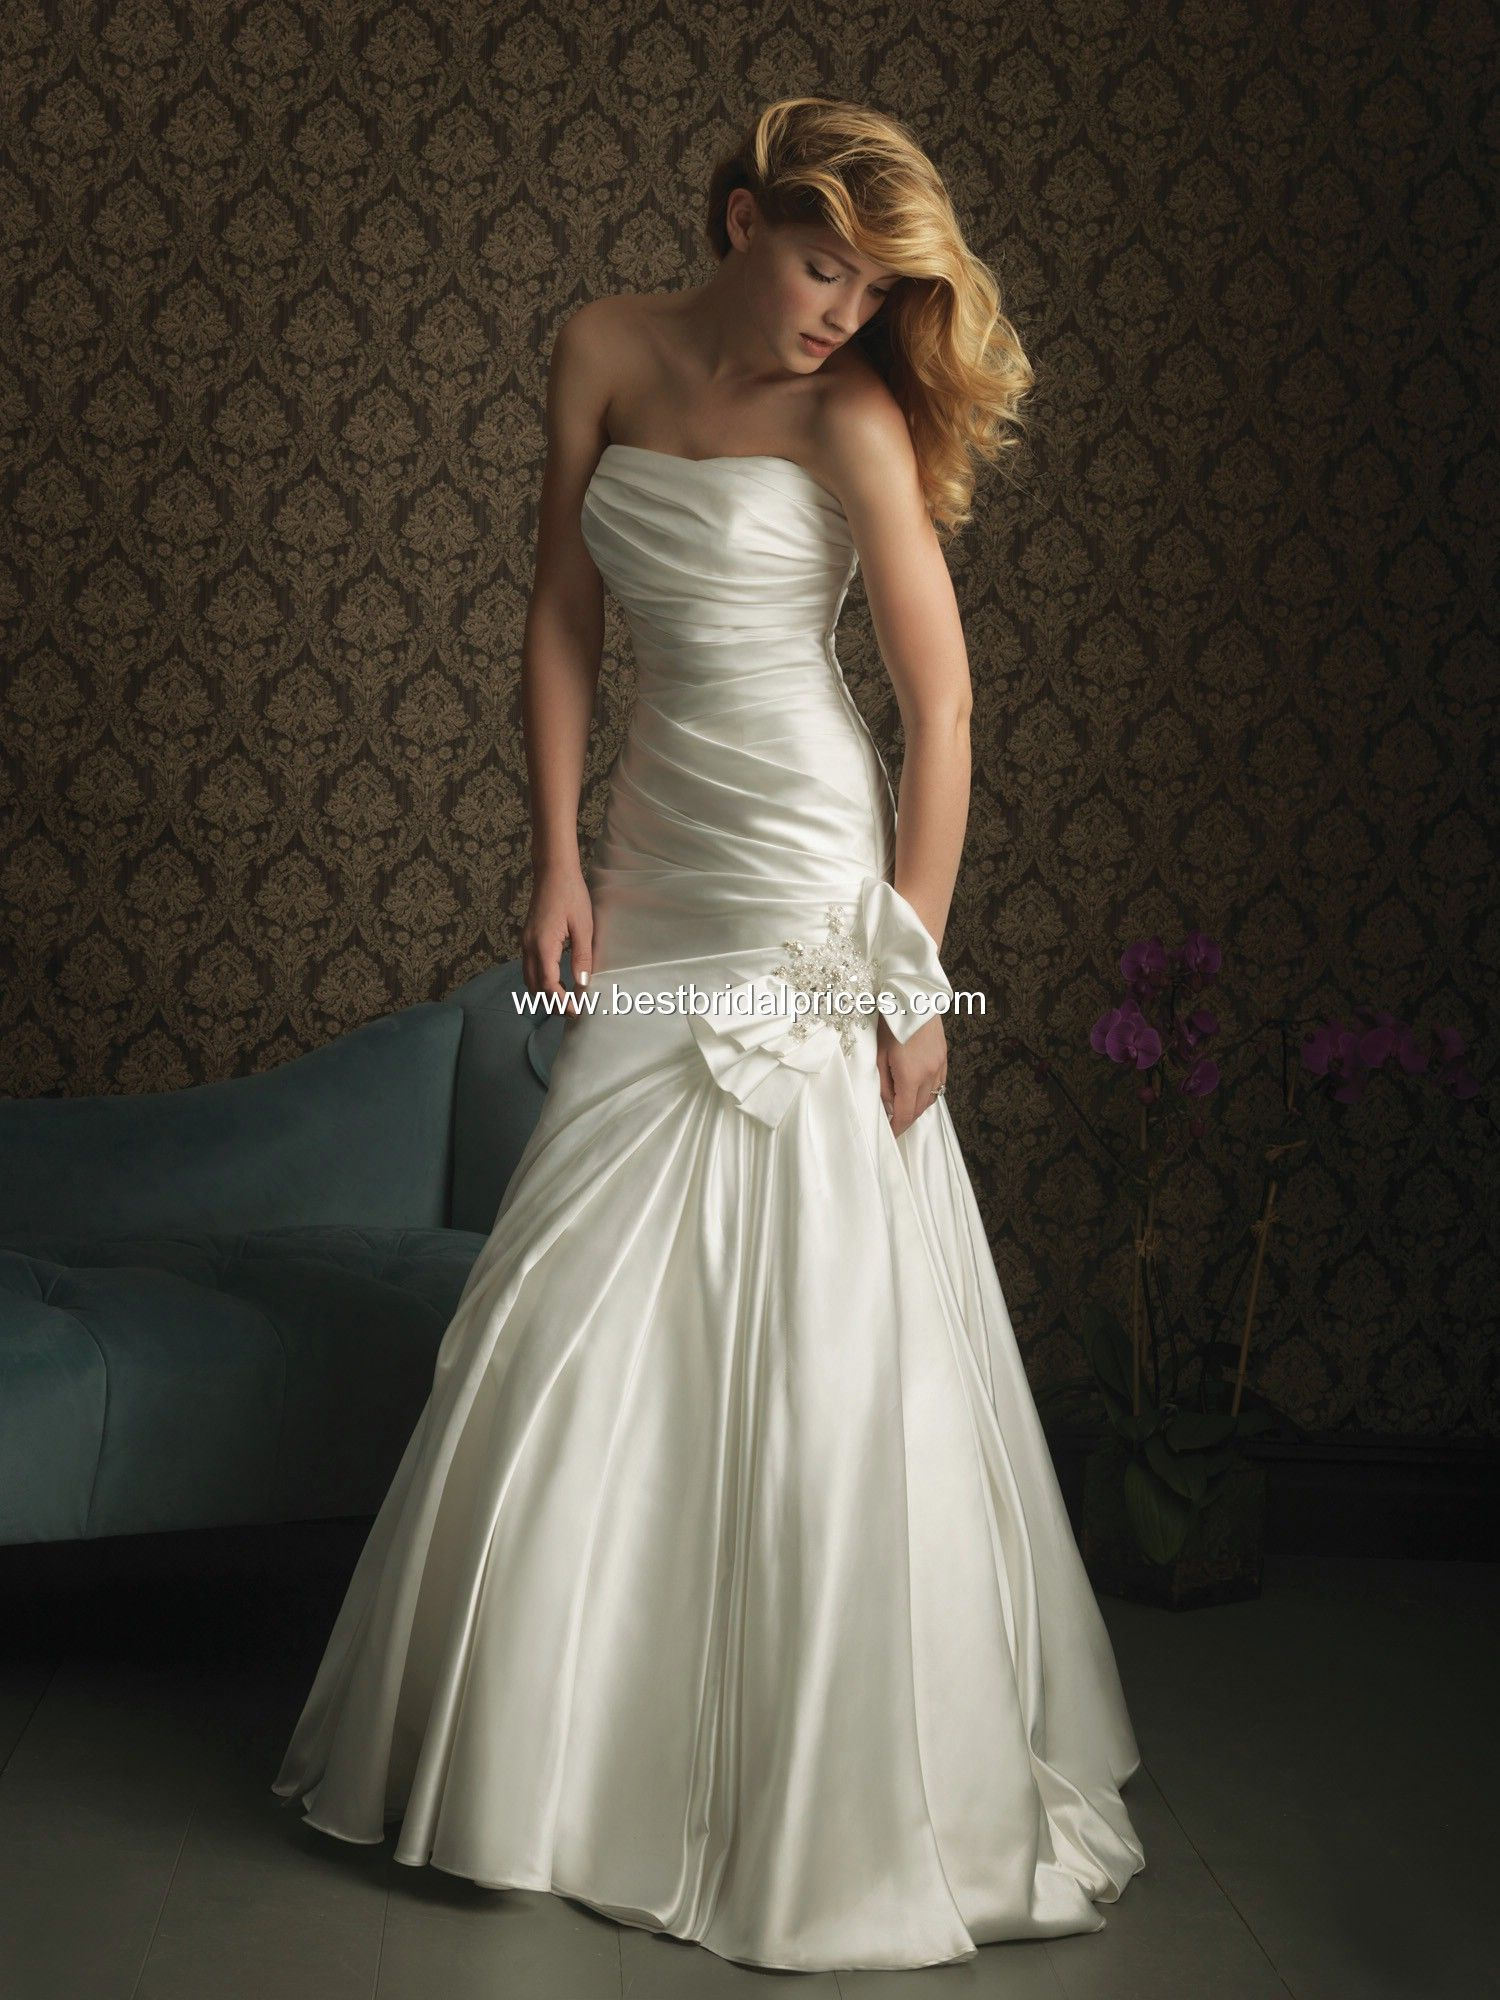 Allure wedding dresses style the planner pinterest